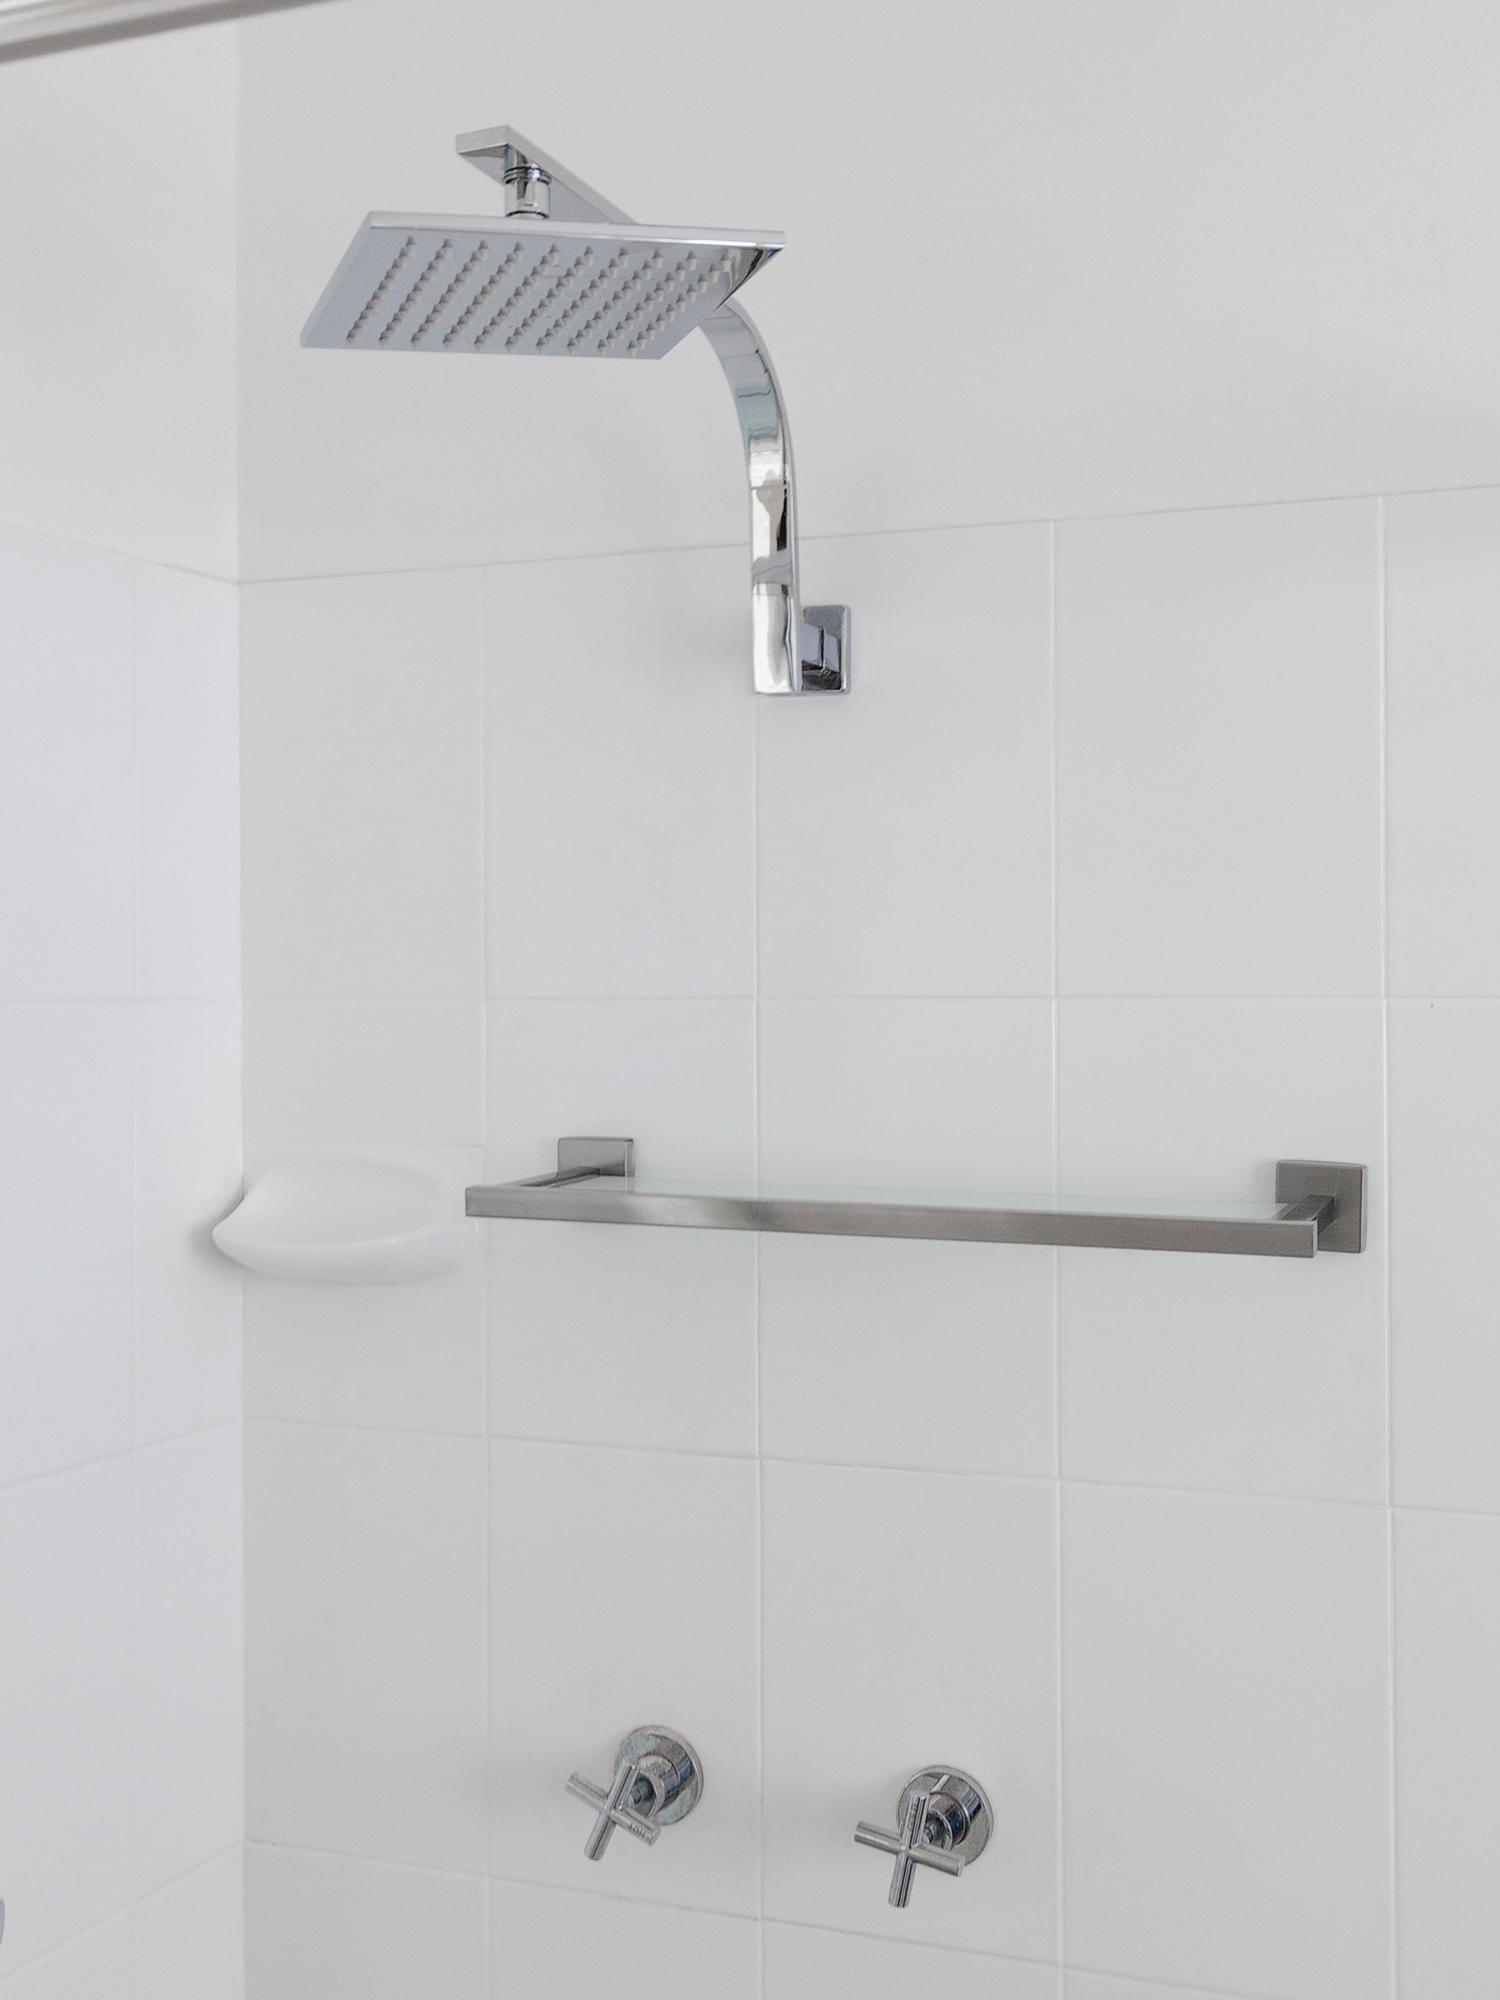 DIY-bathroom-shelf-2-2000x1500.jpg